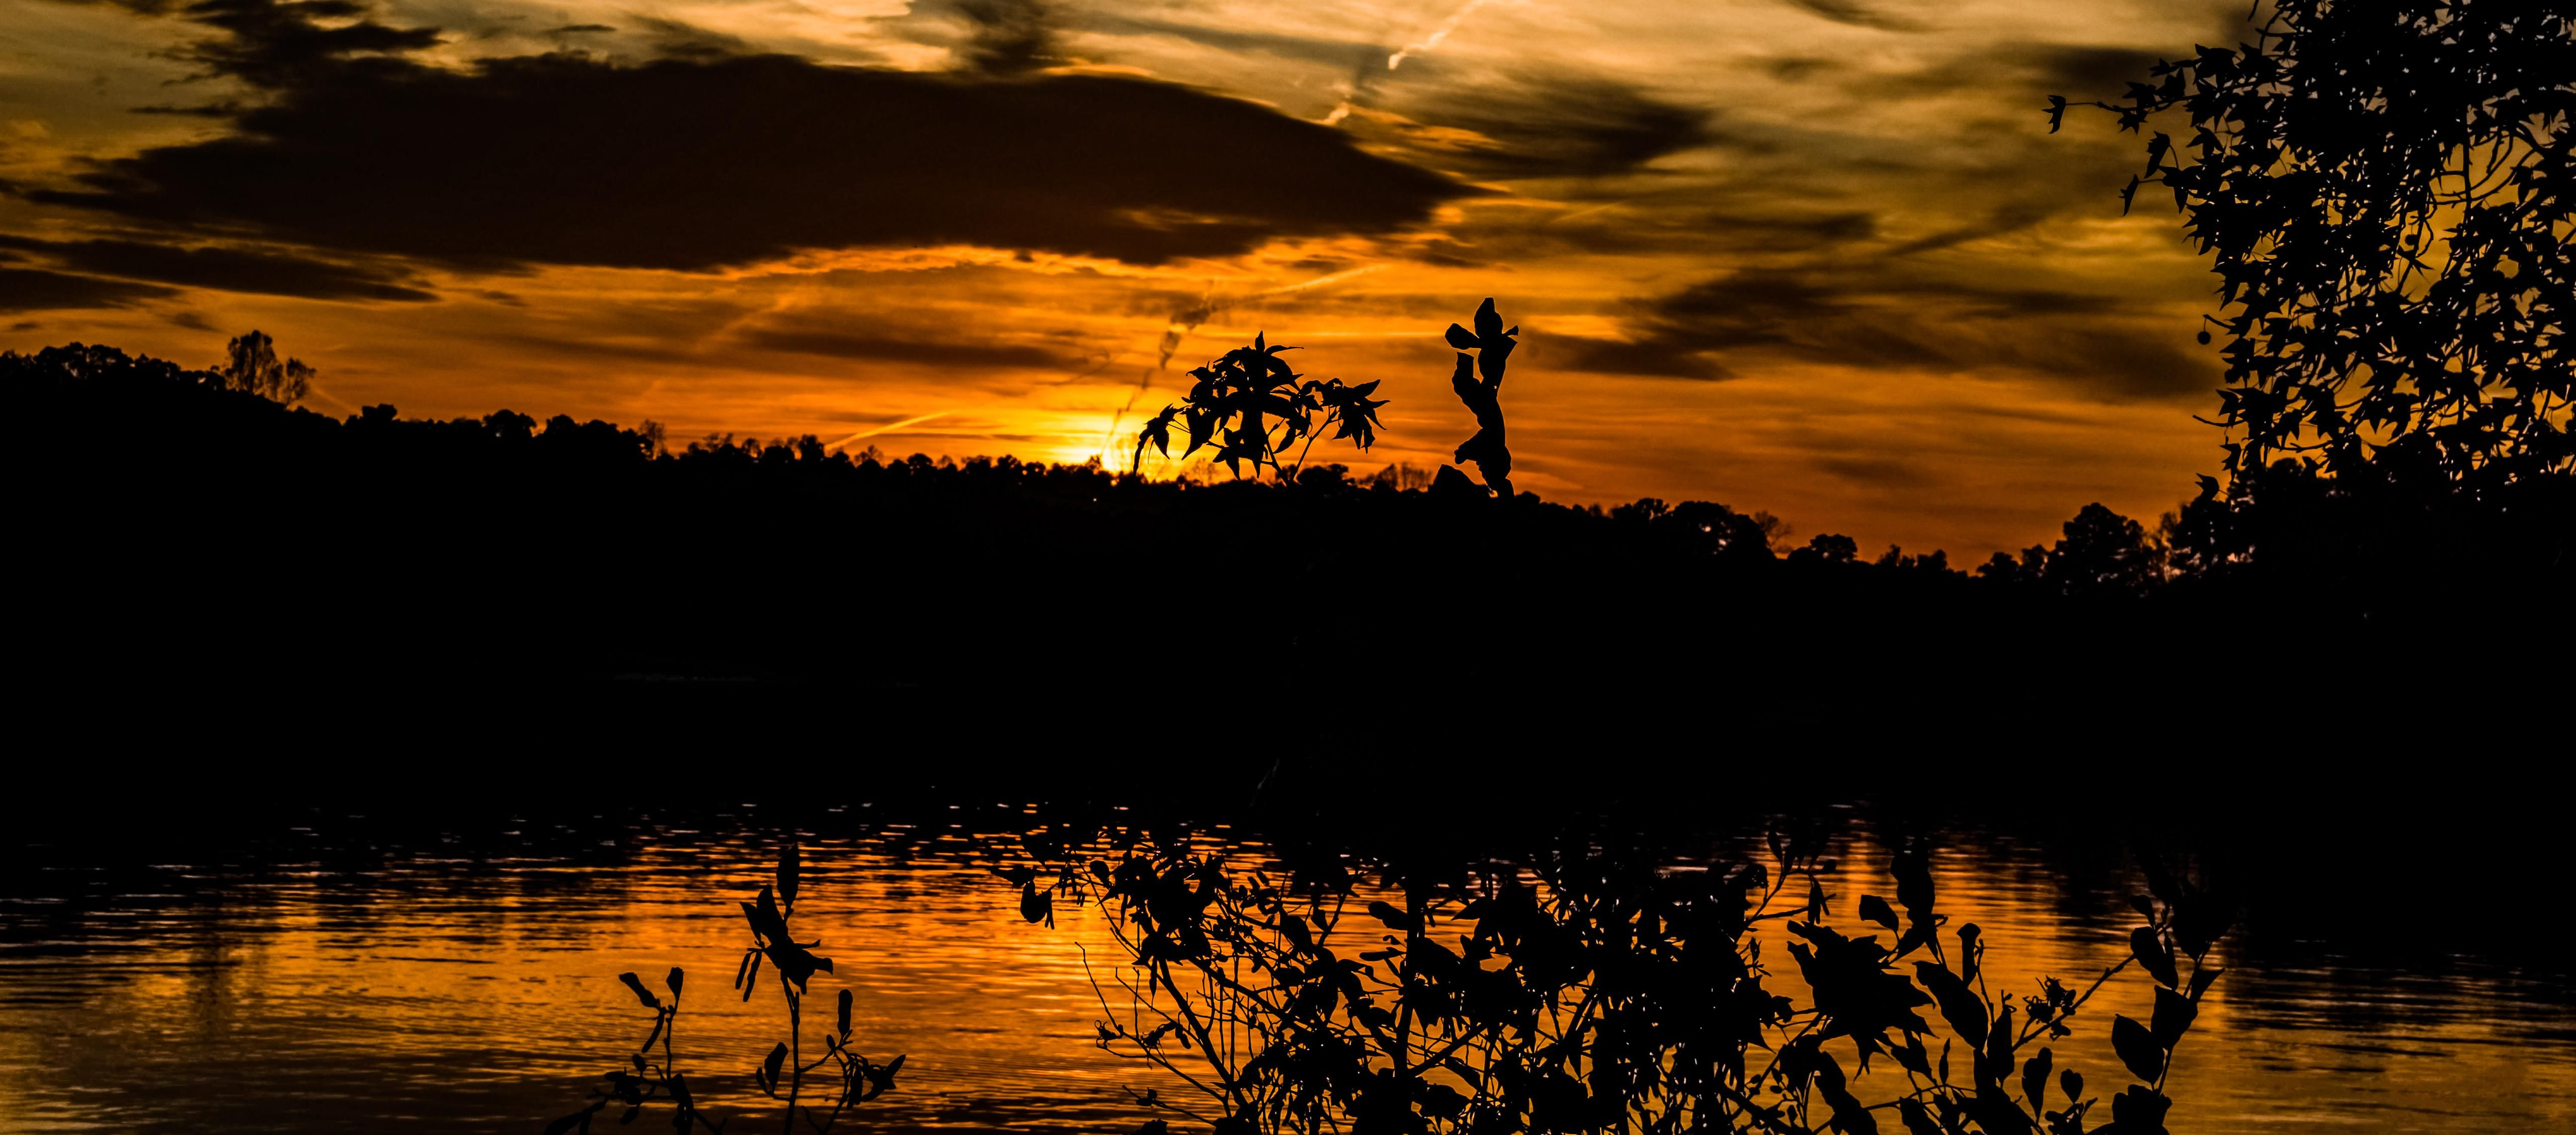 Sunset Over Mountain Island Lake In 2020 Island Lake Sunset Lake